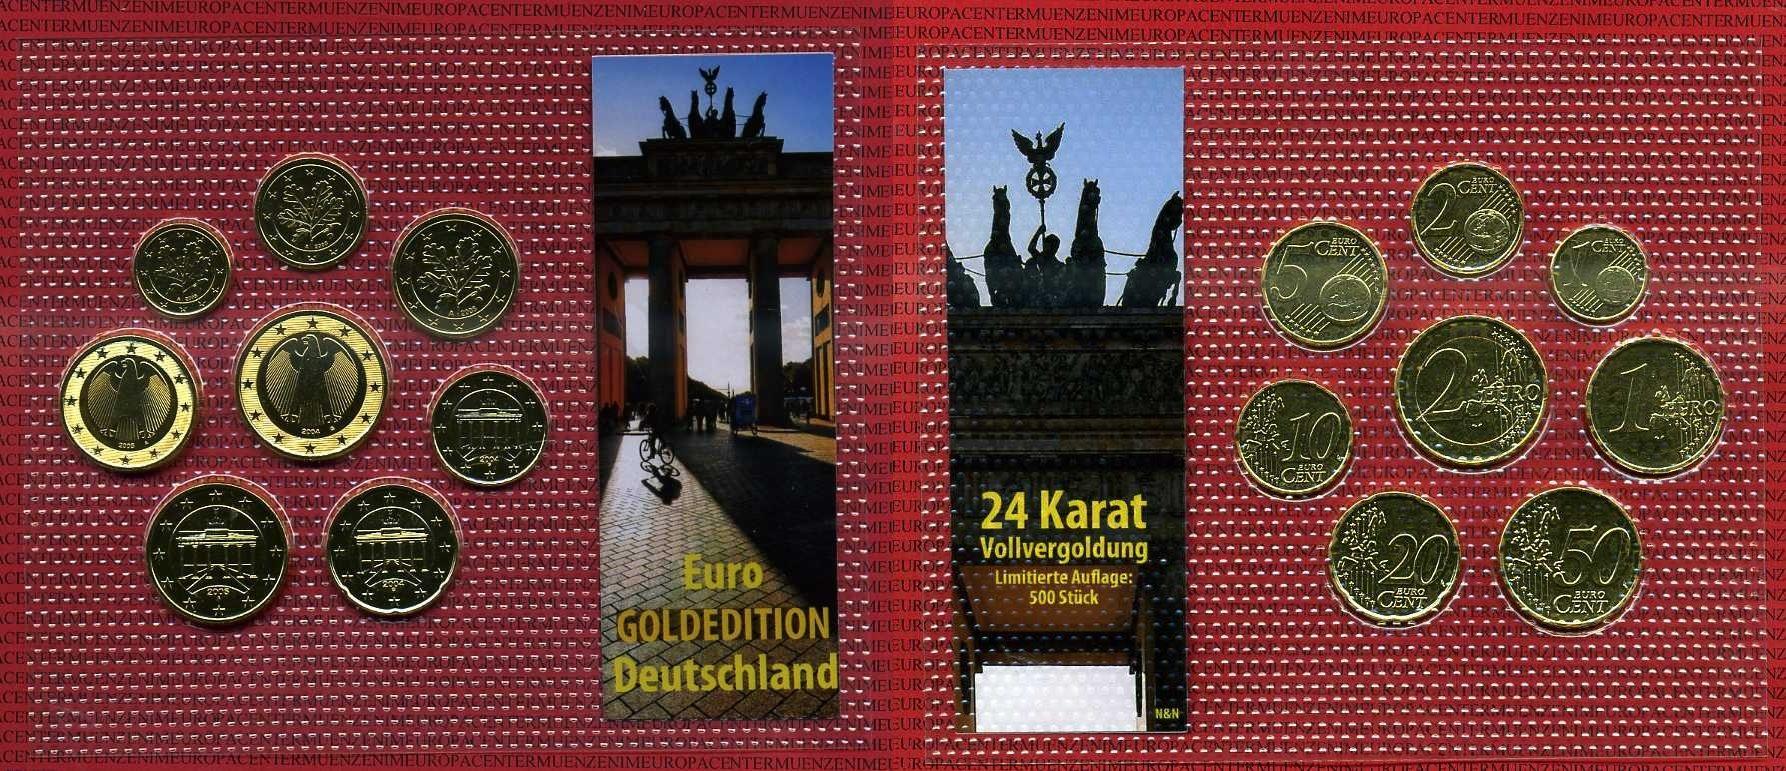 kms euro verschiedene bundesrepublik deutschland. Black Bedroom Furniture Sets. Home Design Ideas